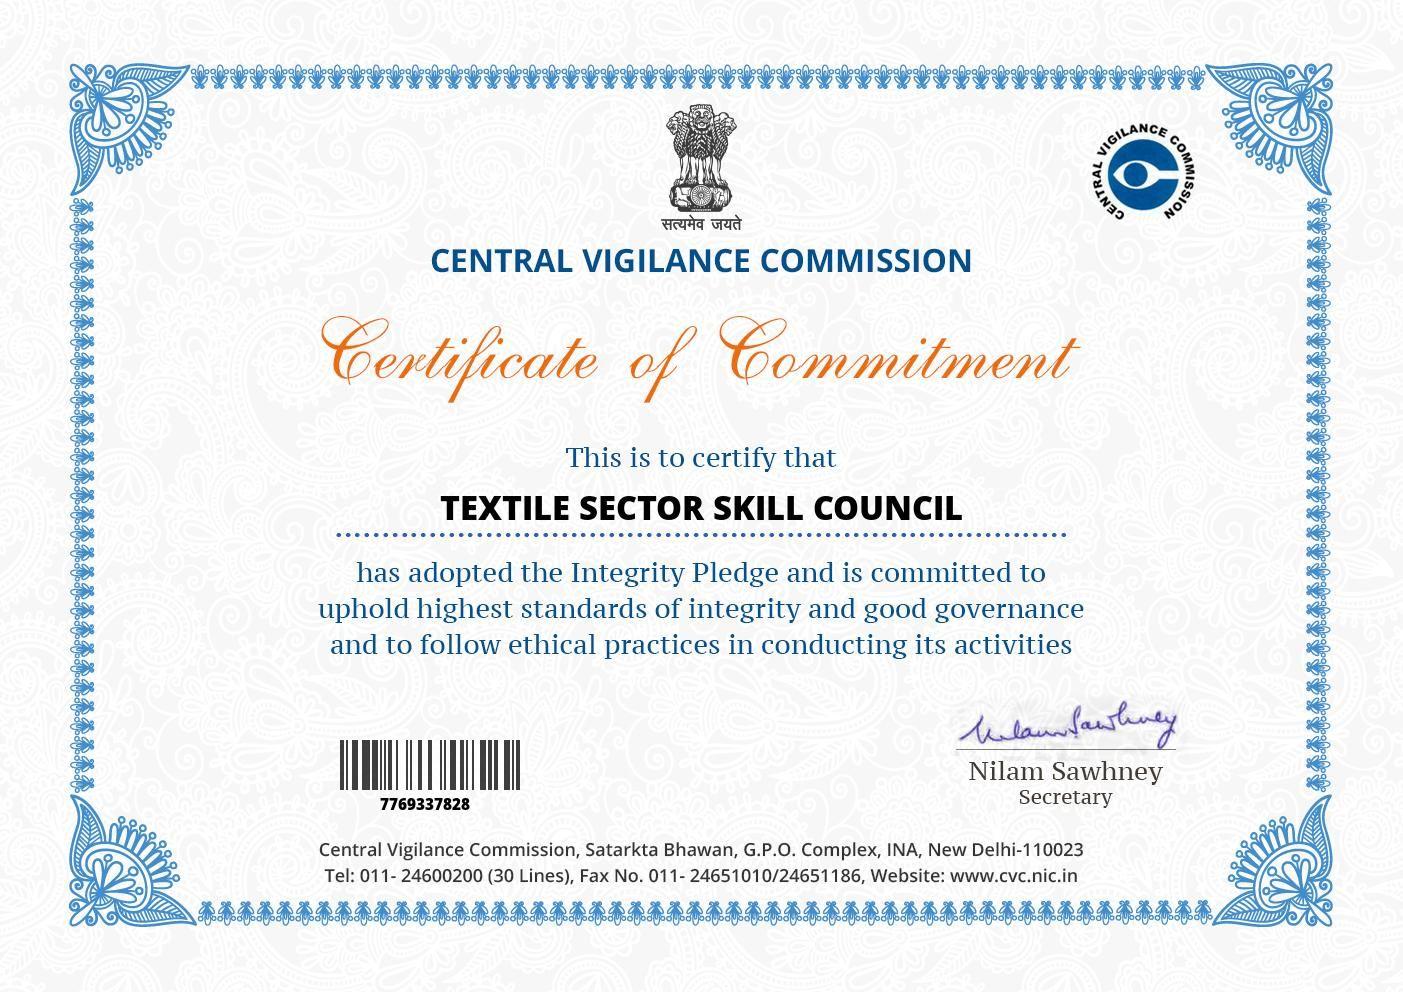 Sona Yukti takes the Integrity Pledge for a corruption